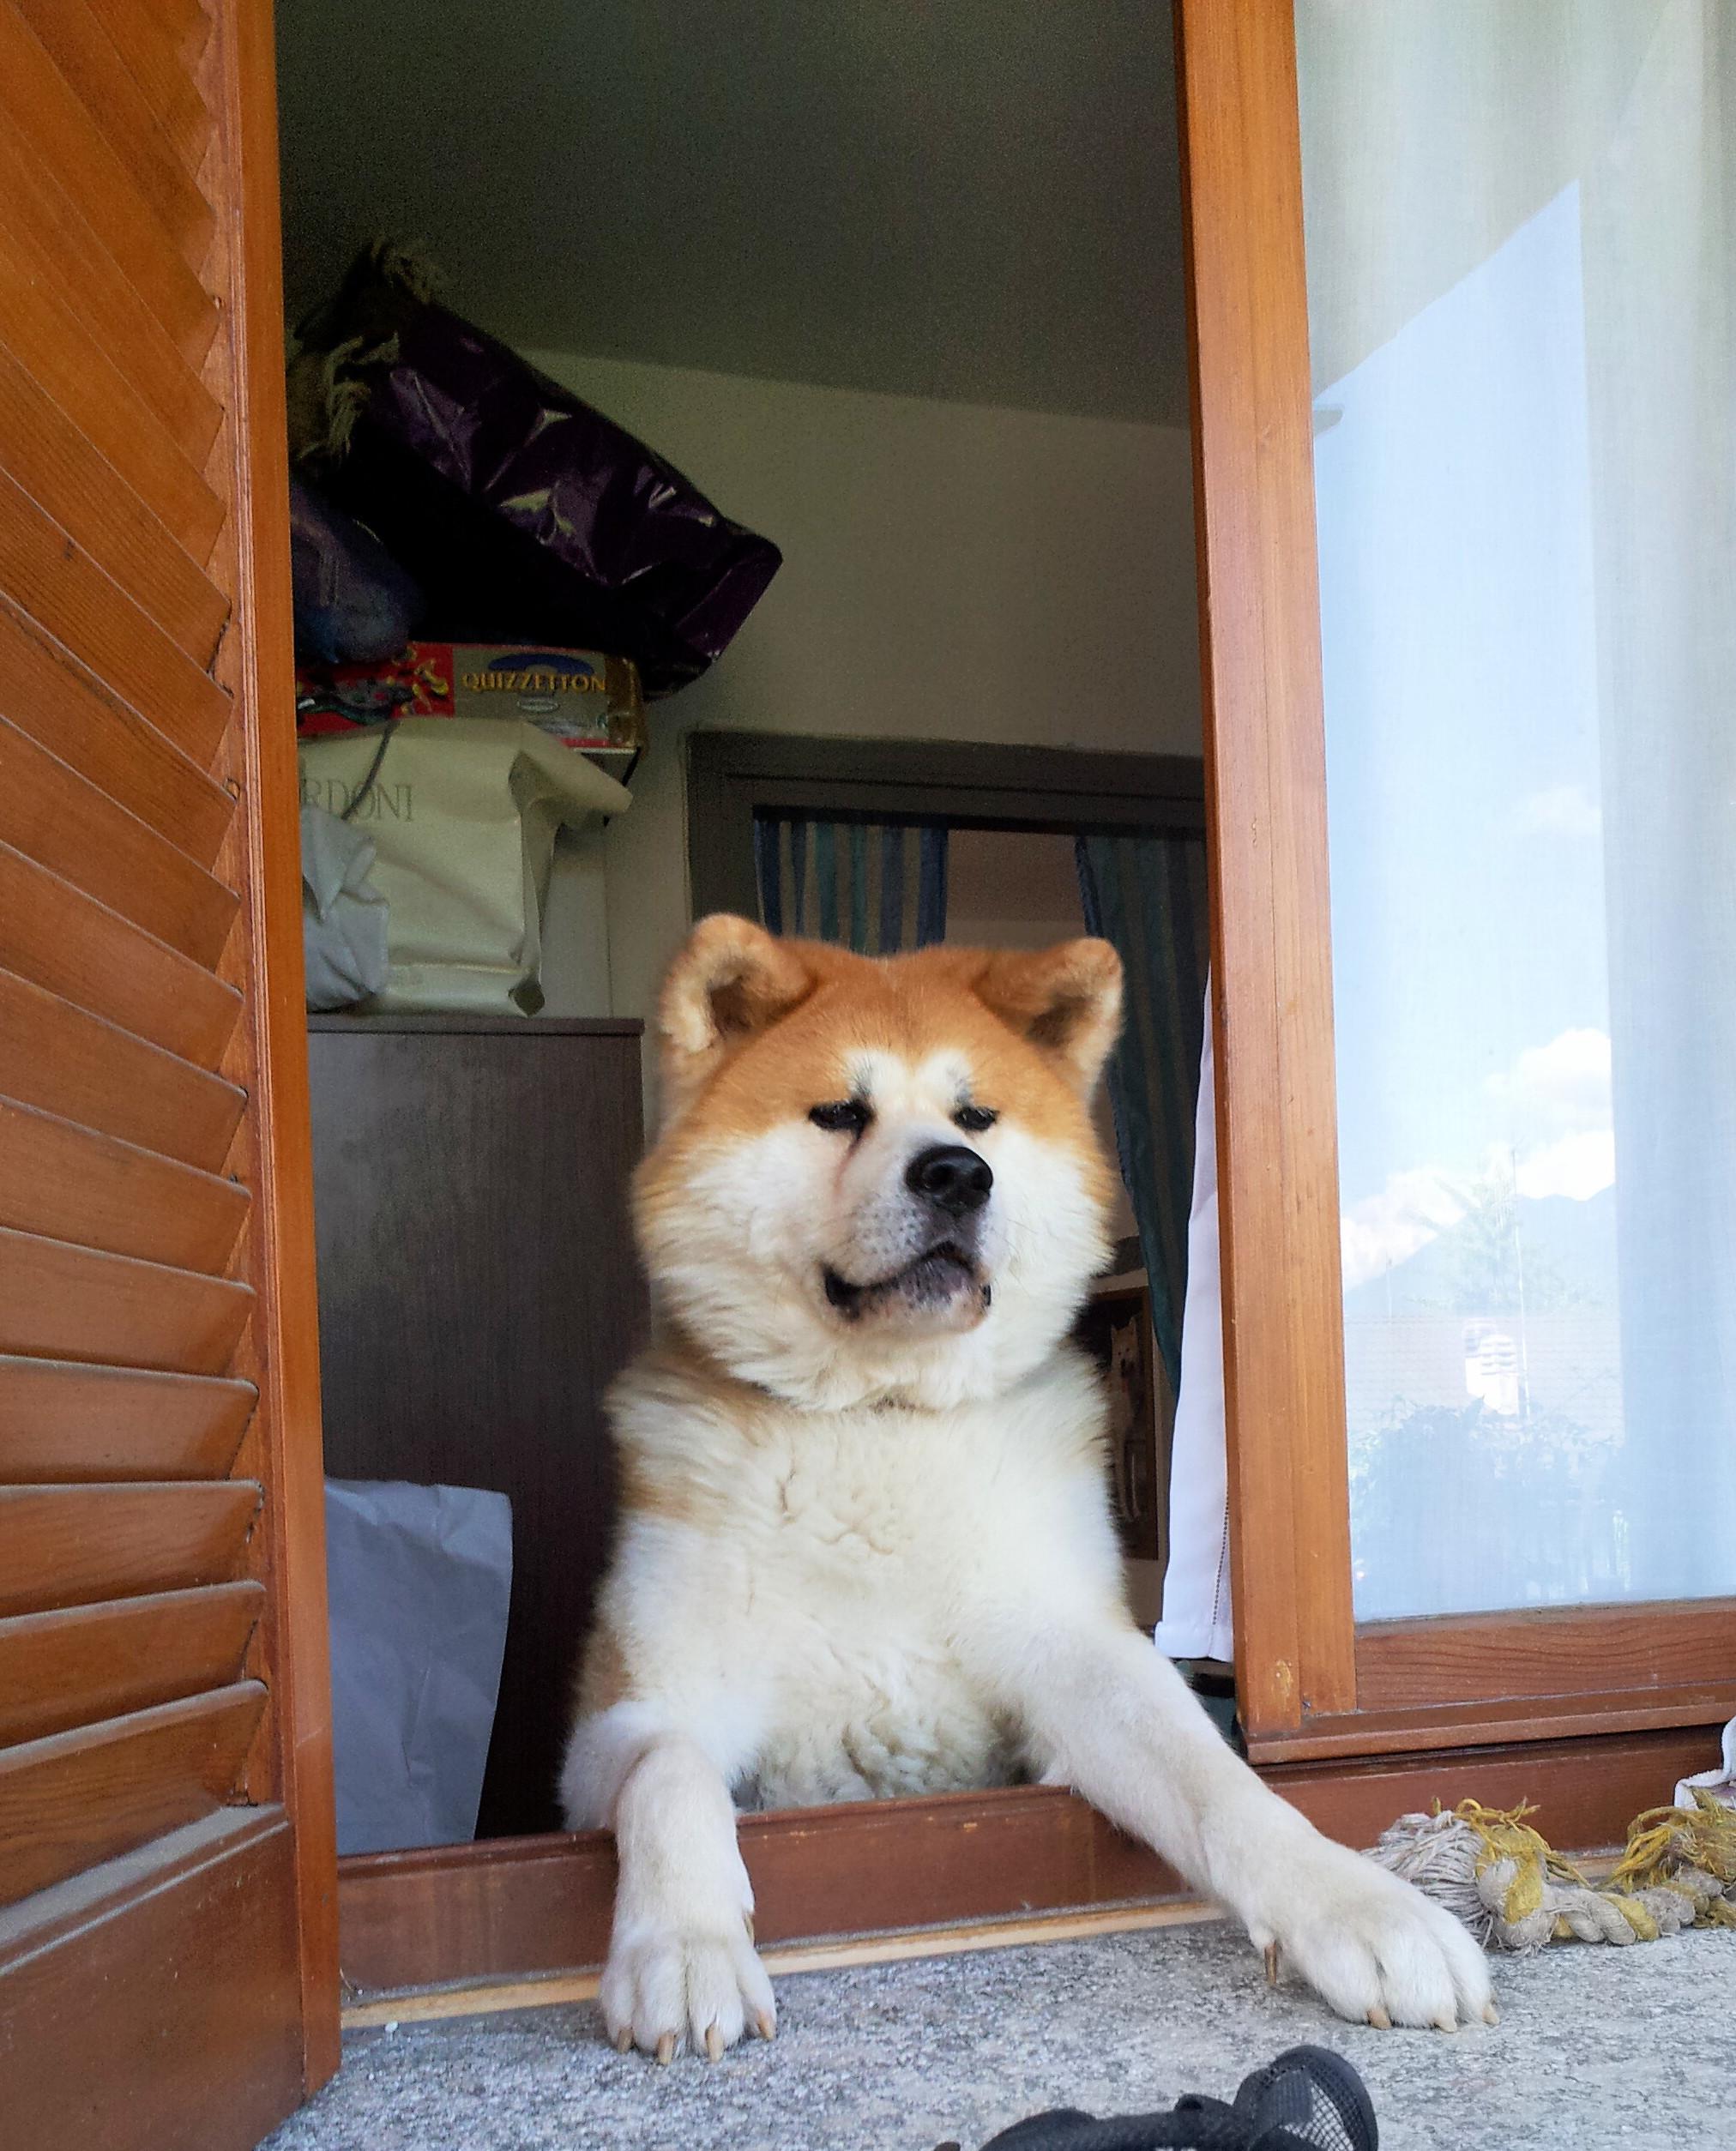 Affacciati alla finestra kumatani kensha - Jovanotti affacciati alla finestra ...